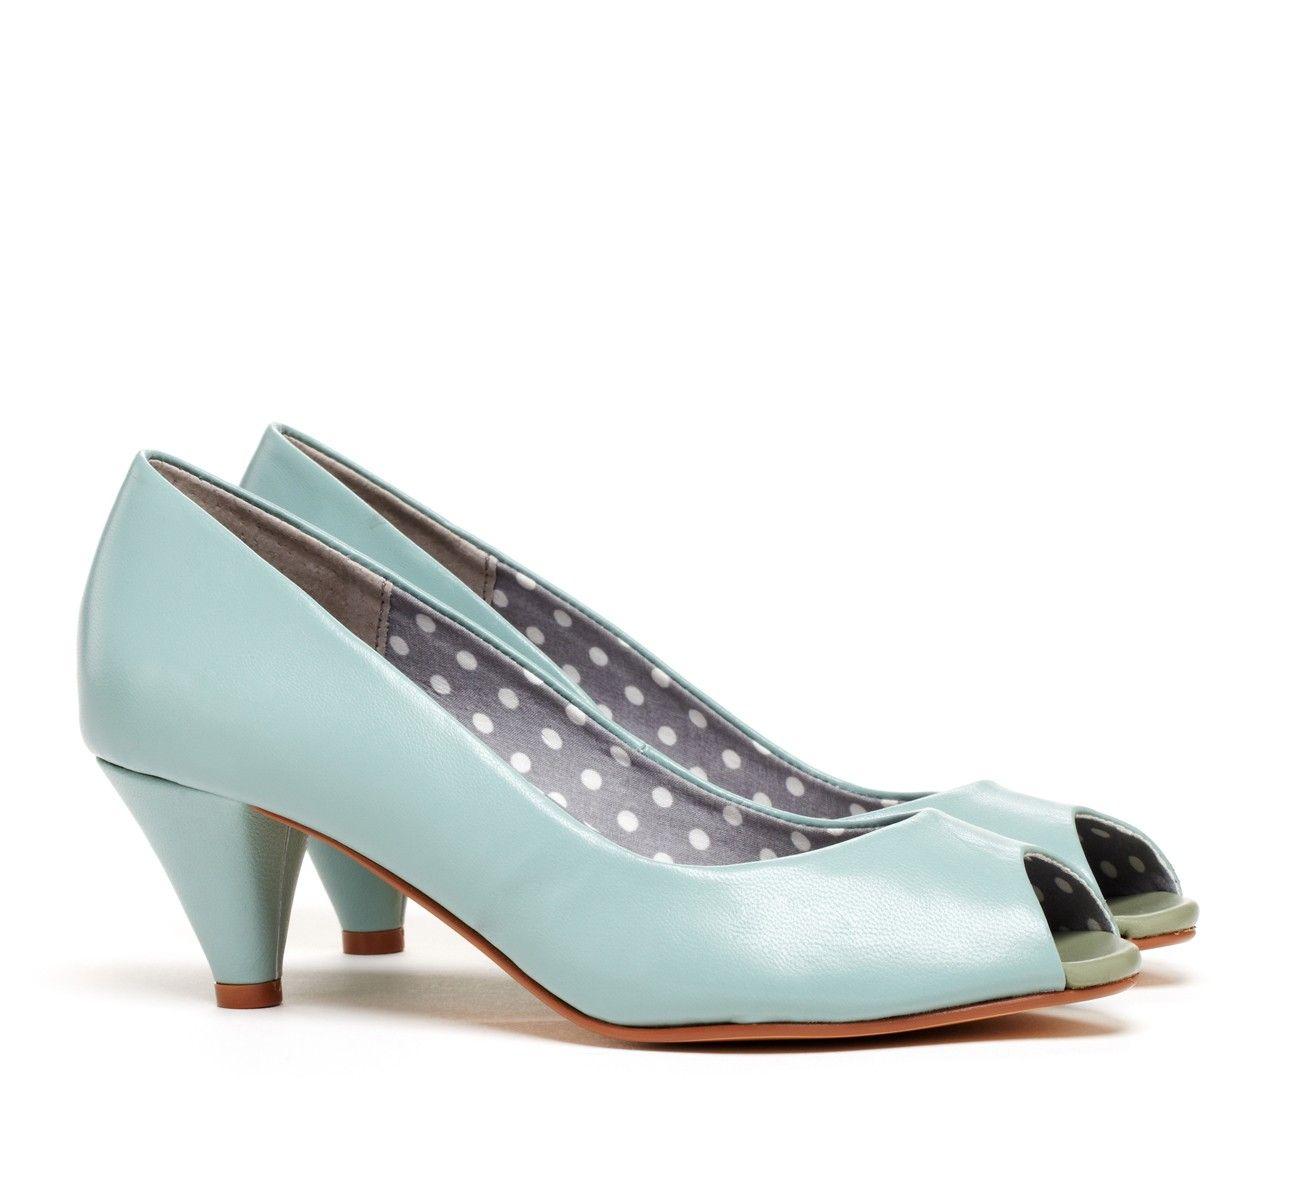 Bethany low heel pump sole society ueue wonderful shoe love the